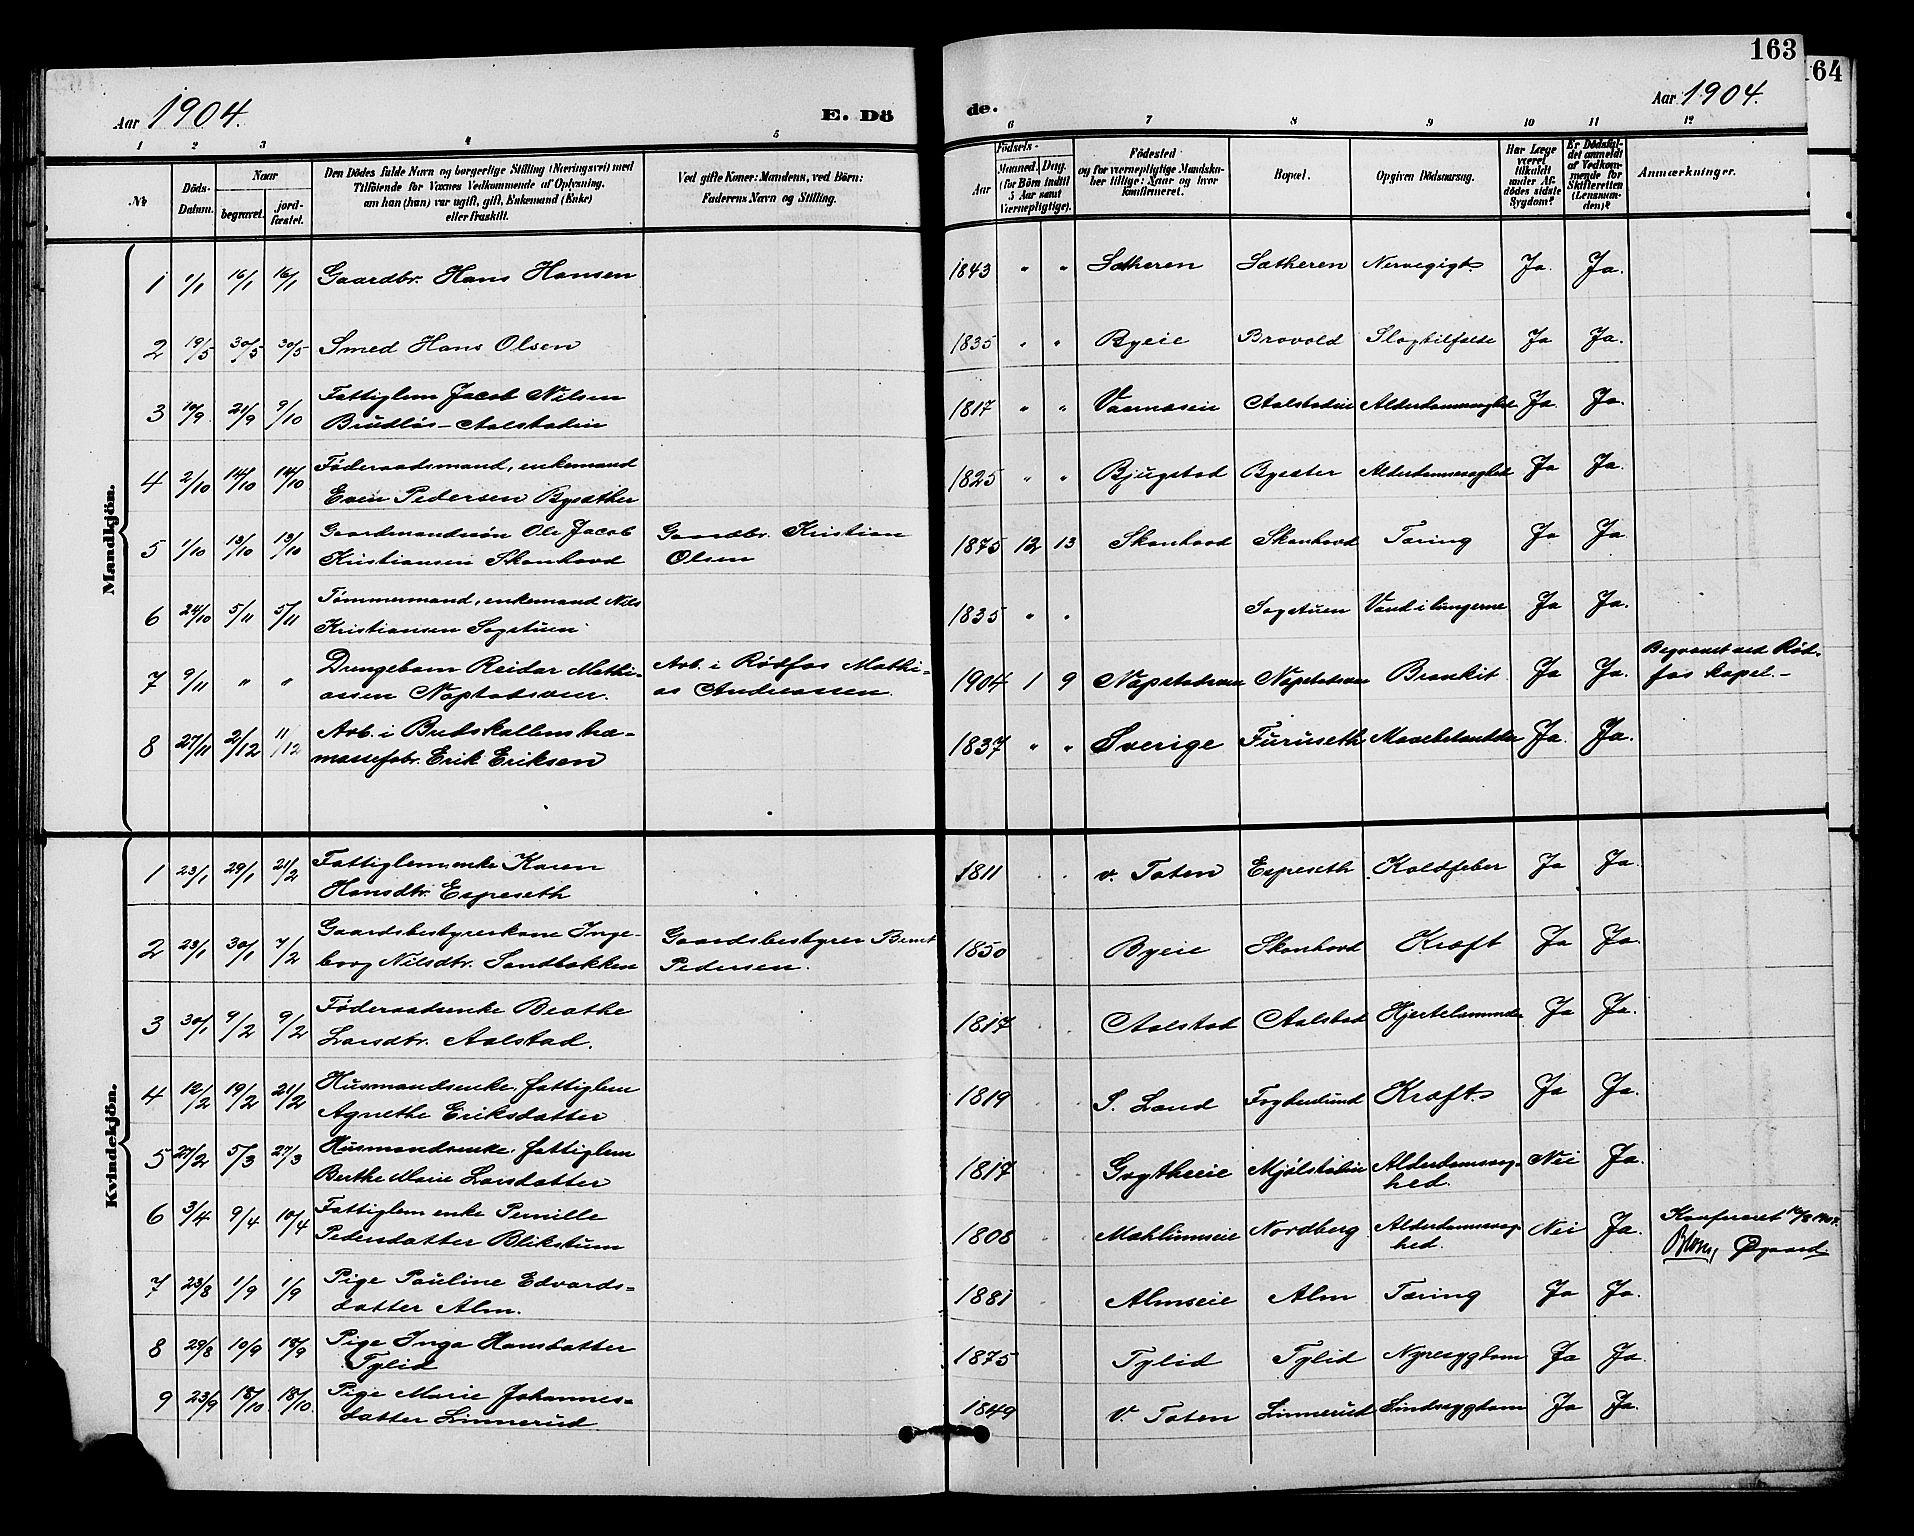 SAH, Vardal prestekontor, H/Ha/Hab/L0011: Klokkerbok nr. 11, 1899-1913, s. 163